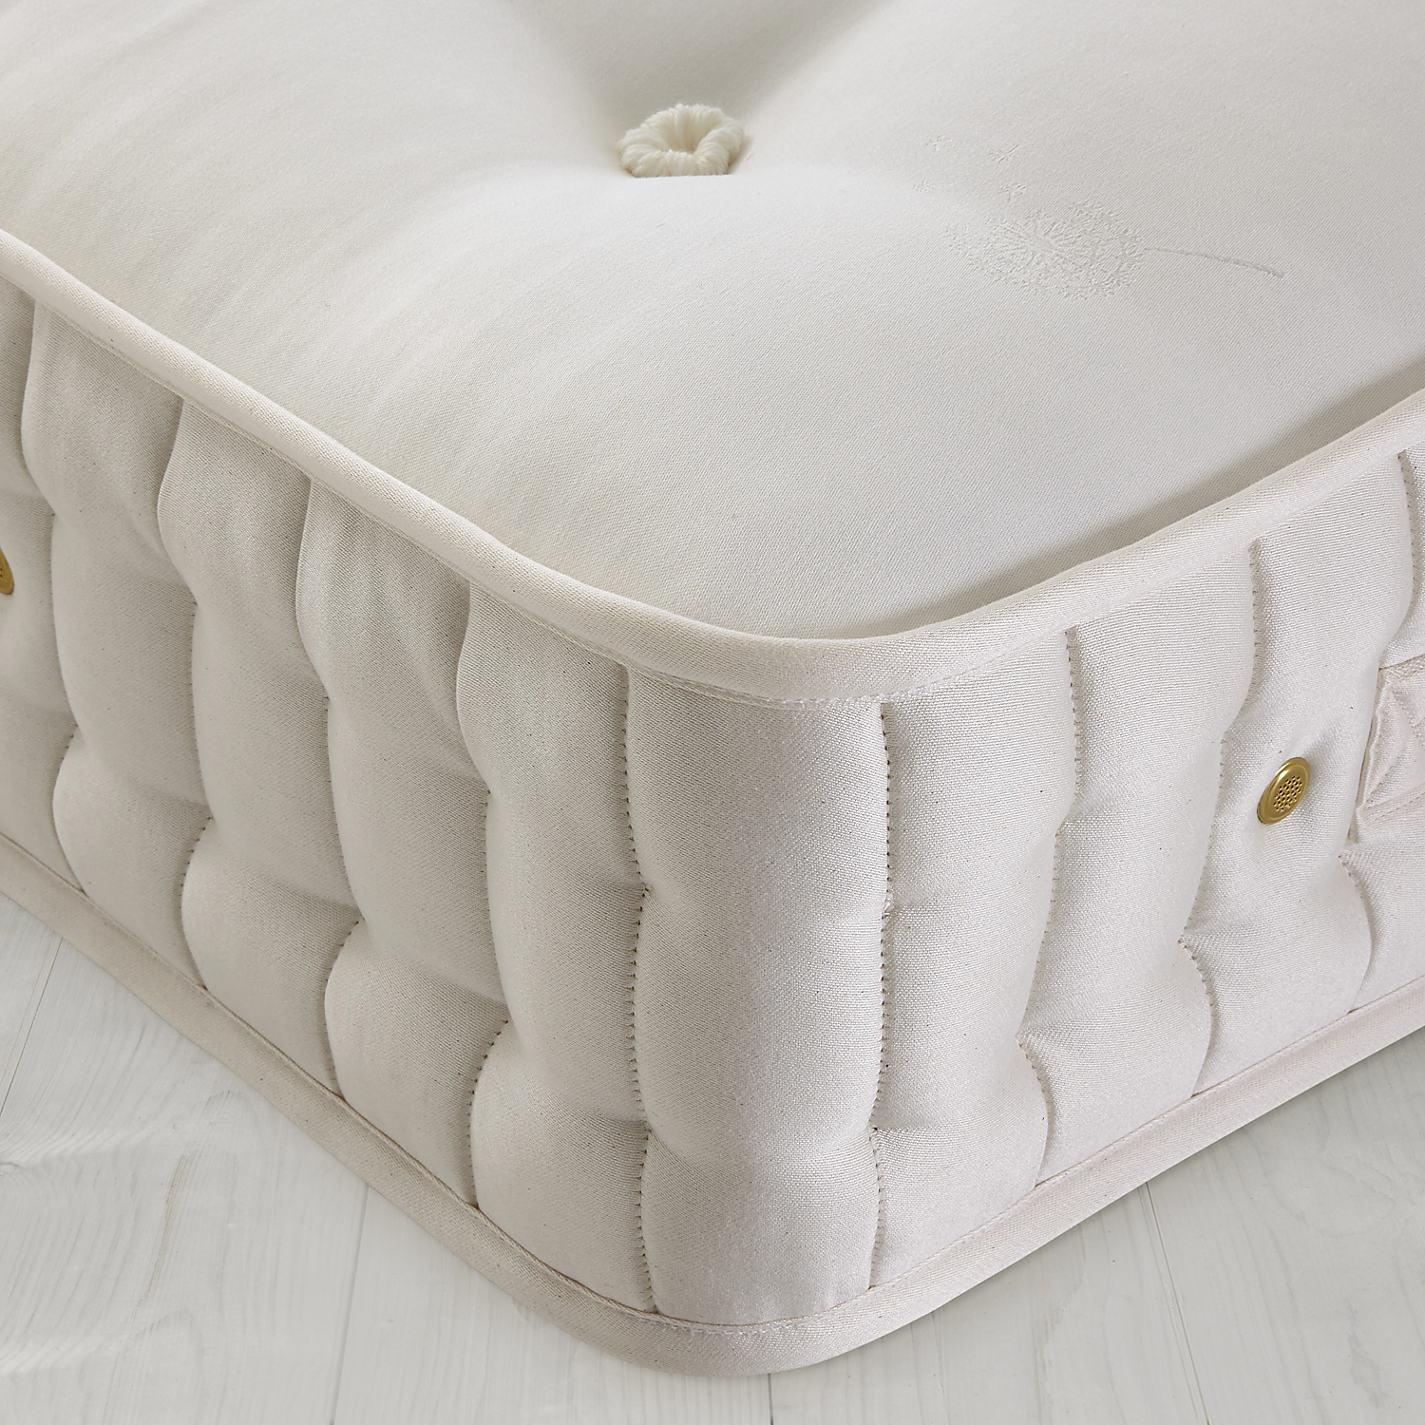 mattress no springs. buy john lewis natural collection 4000 cotton pocket spring mattress, medium, double online at mattress no springs c